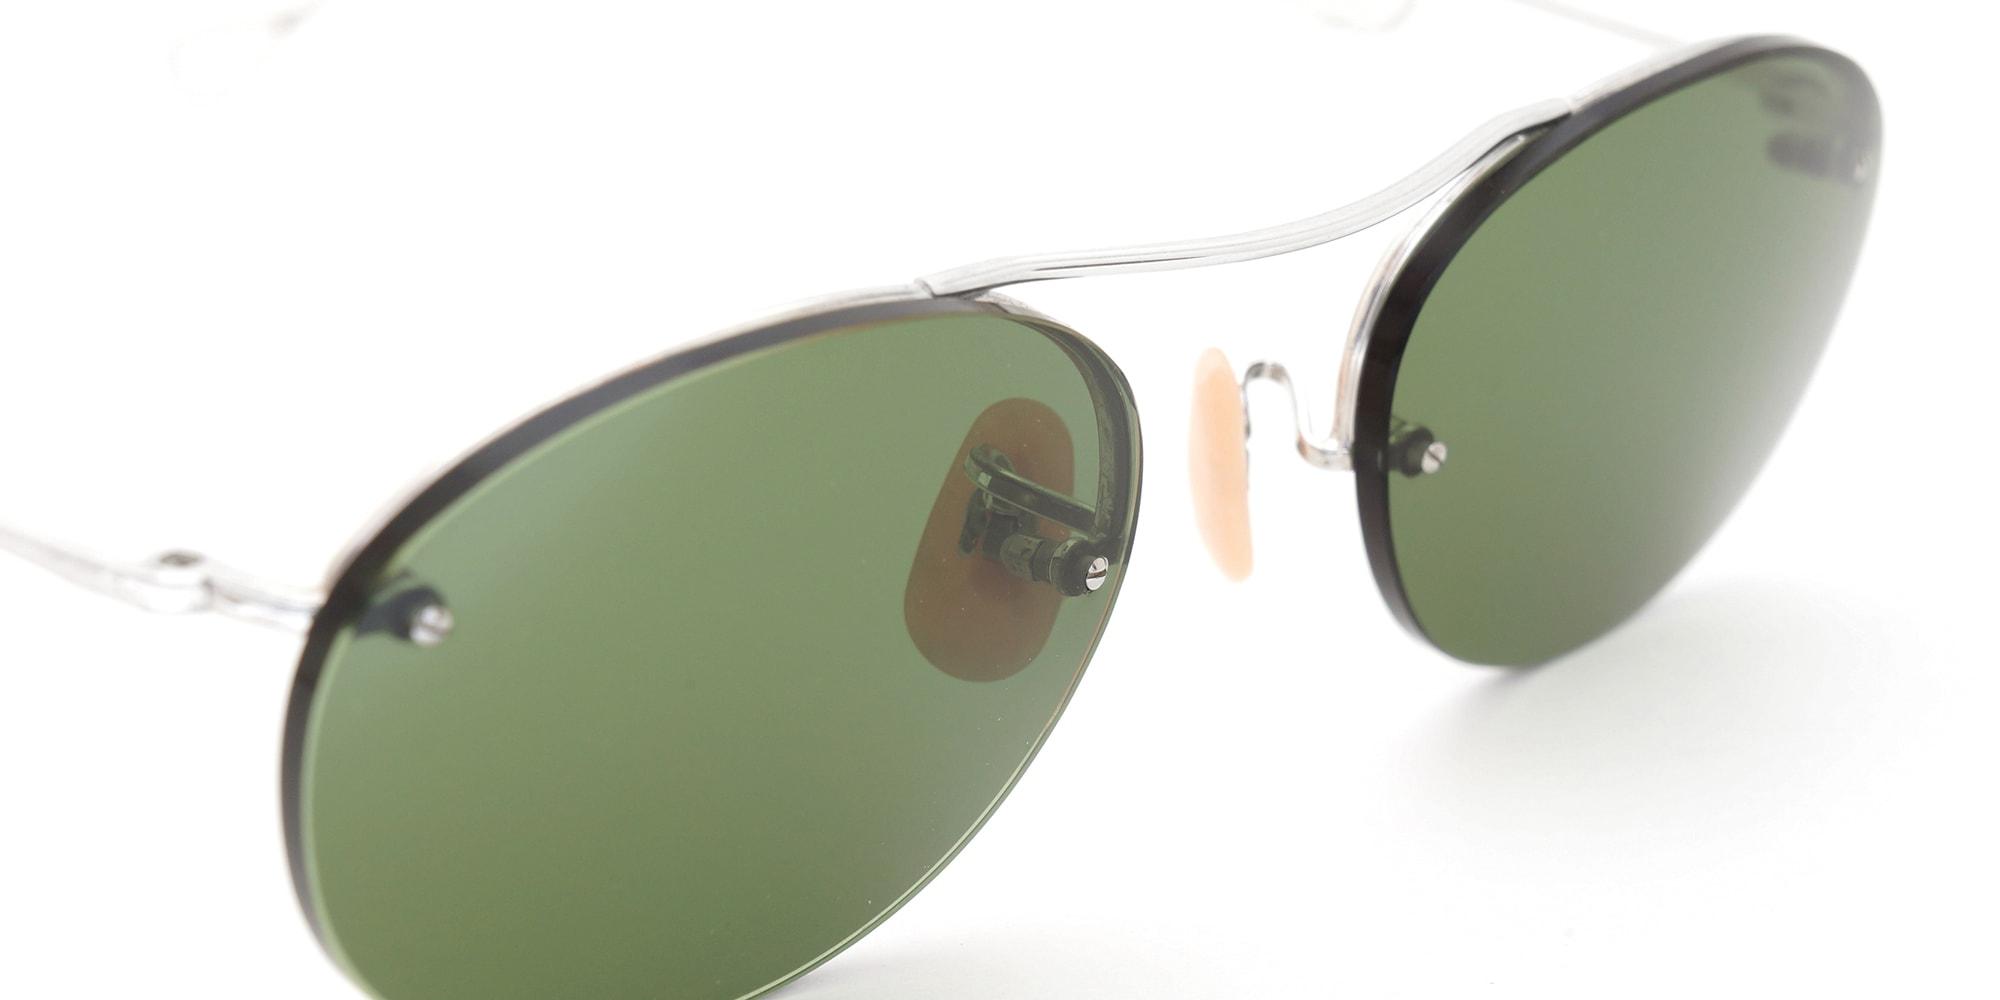 The Spectacle サングラス 1938-1950s SHURON Mid-Century-Modern-Bar 1/10 12KGF 44/20 イメージ7